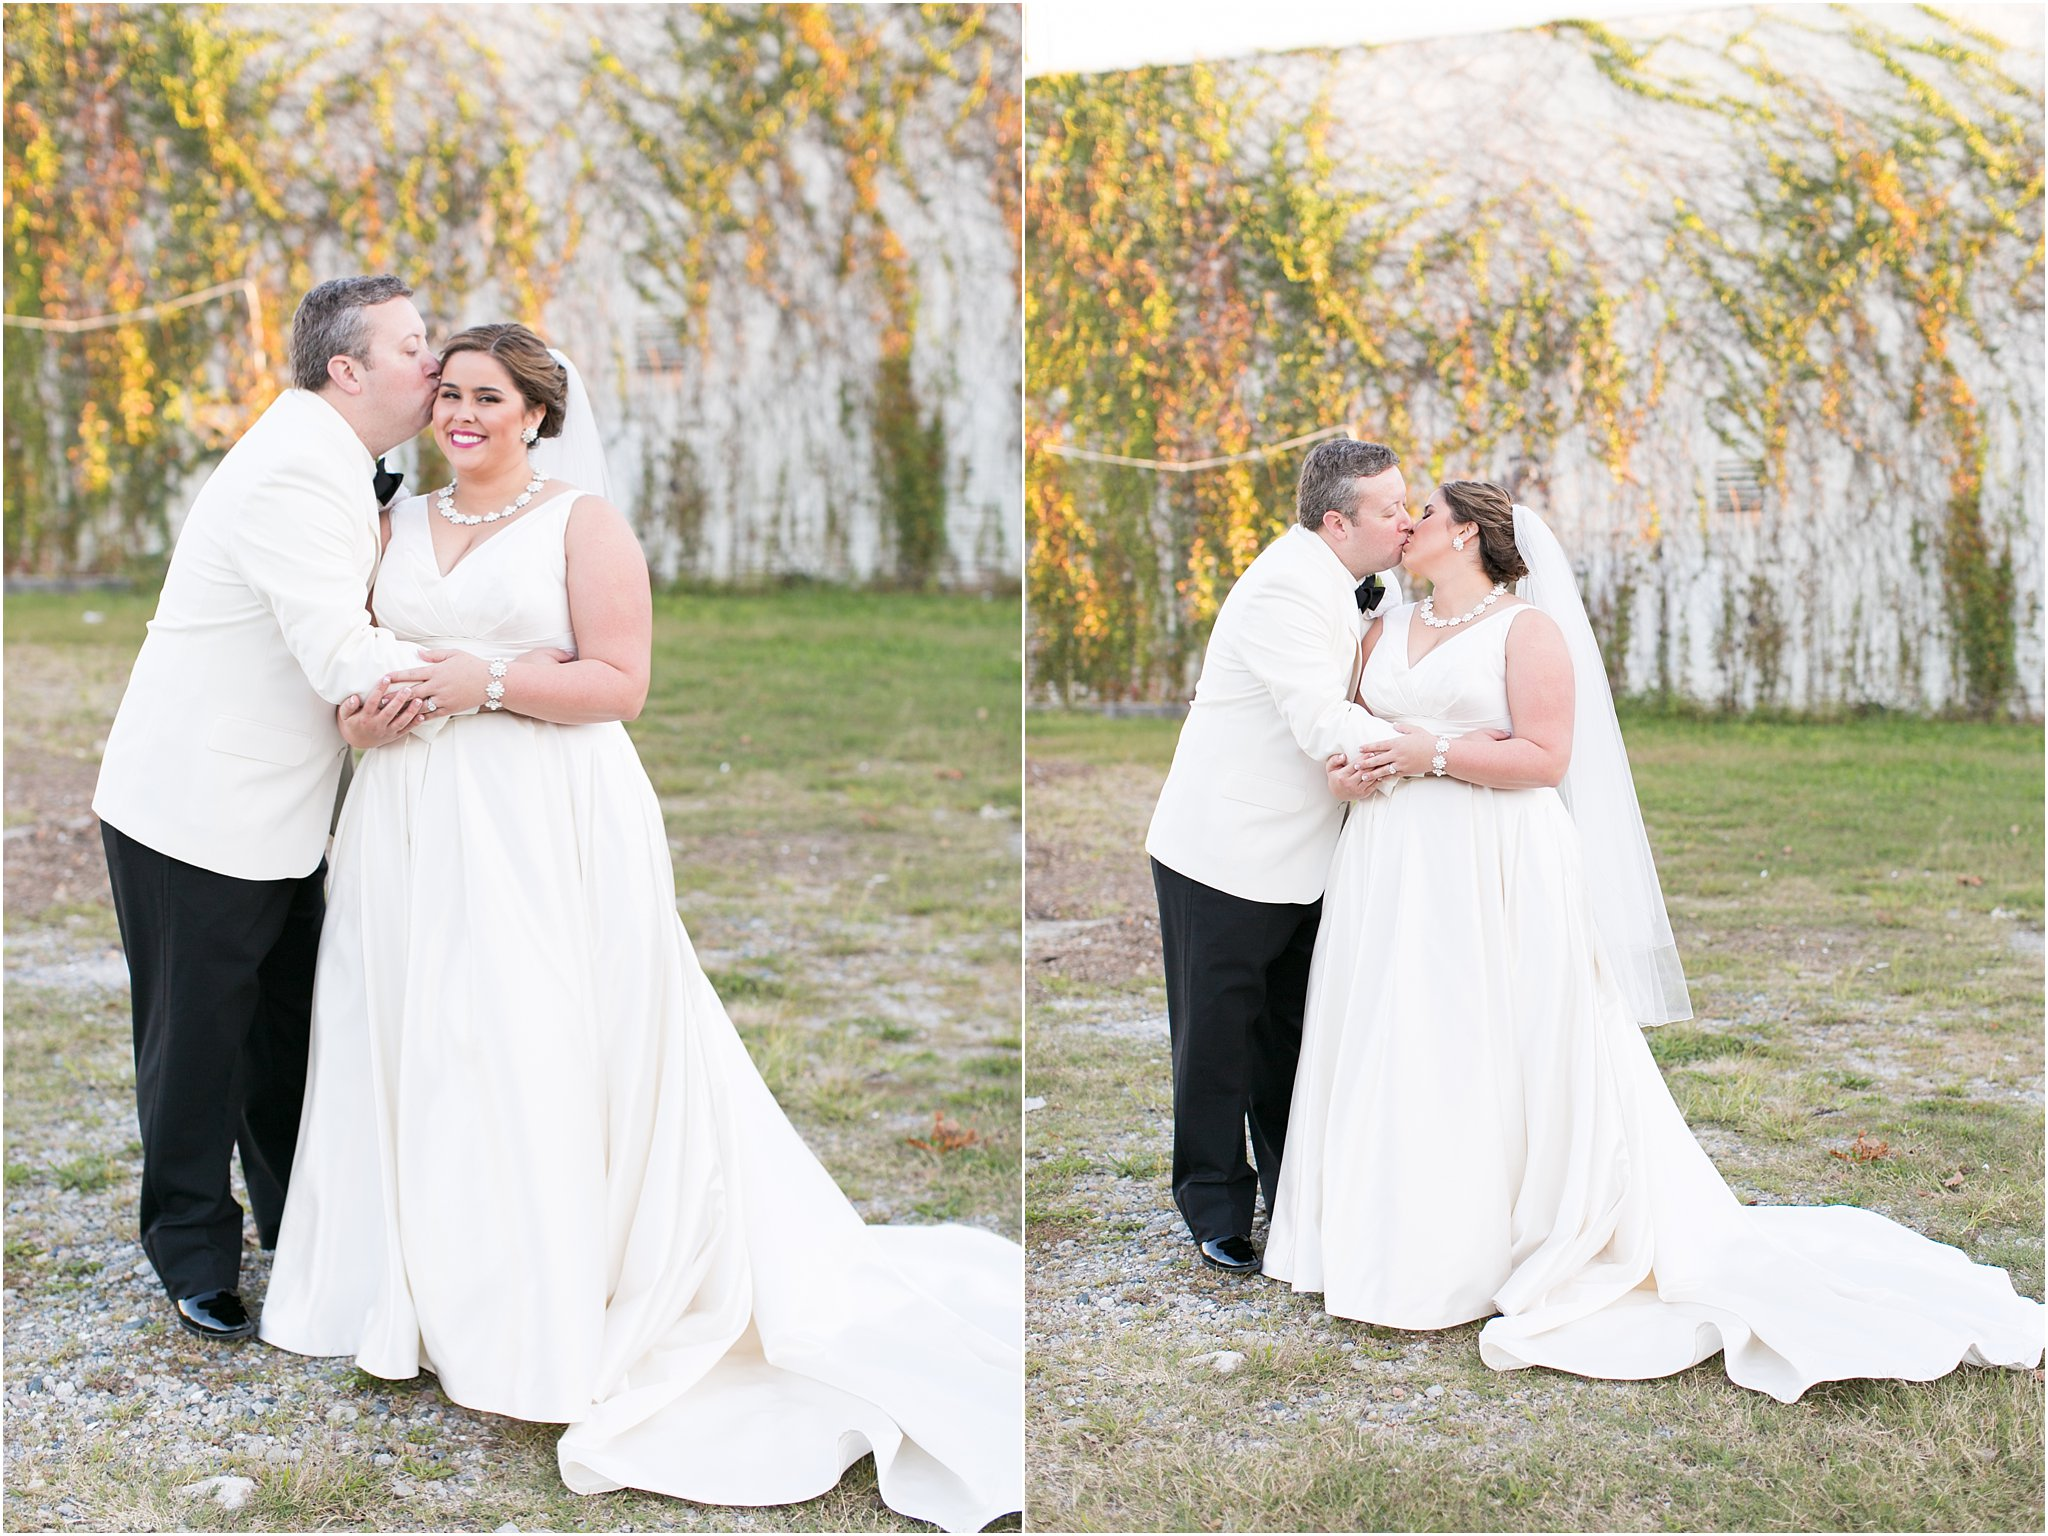 va_jessica_ryan_photography_virginia_wedding_norfolk_harrison_opera_house_norfolk_arts_district_portraits_3819